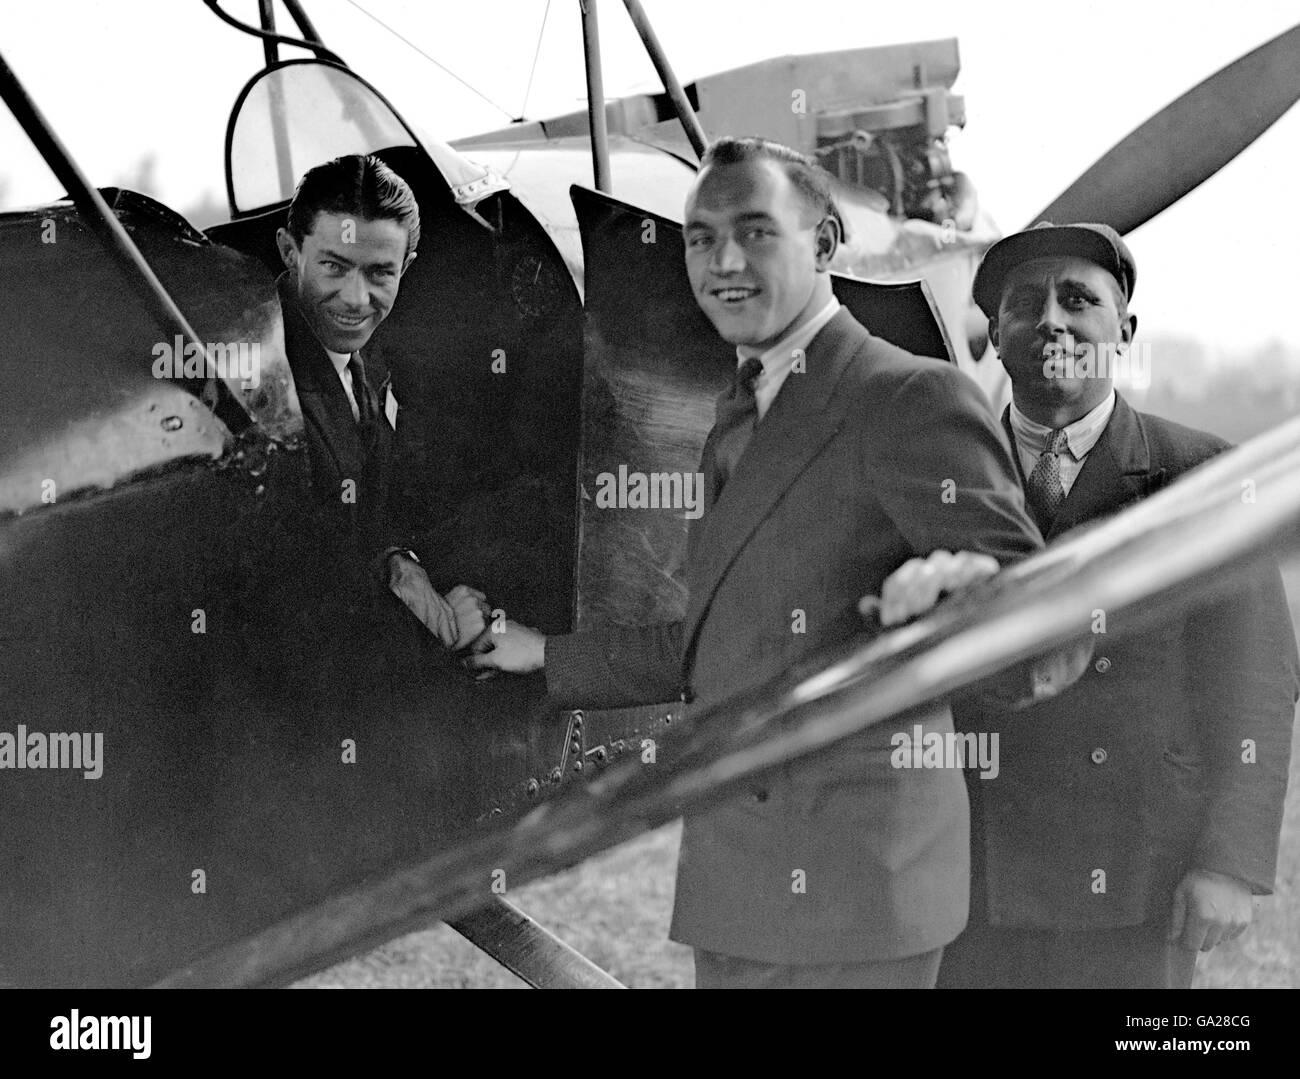 Aviation - LGOC Aero Club - London - Stock Image